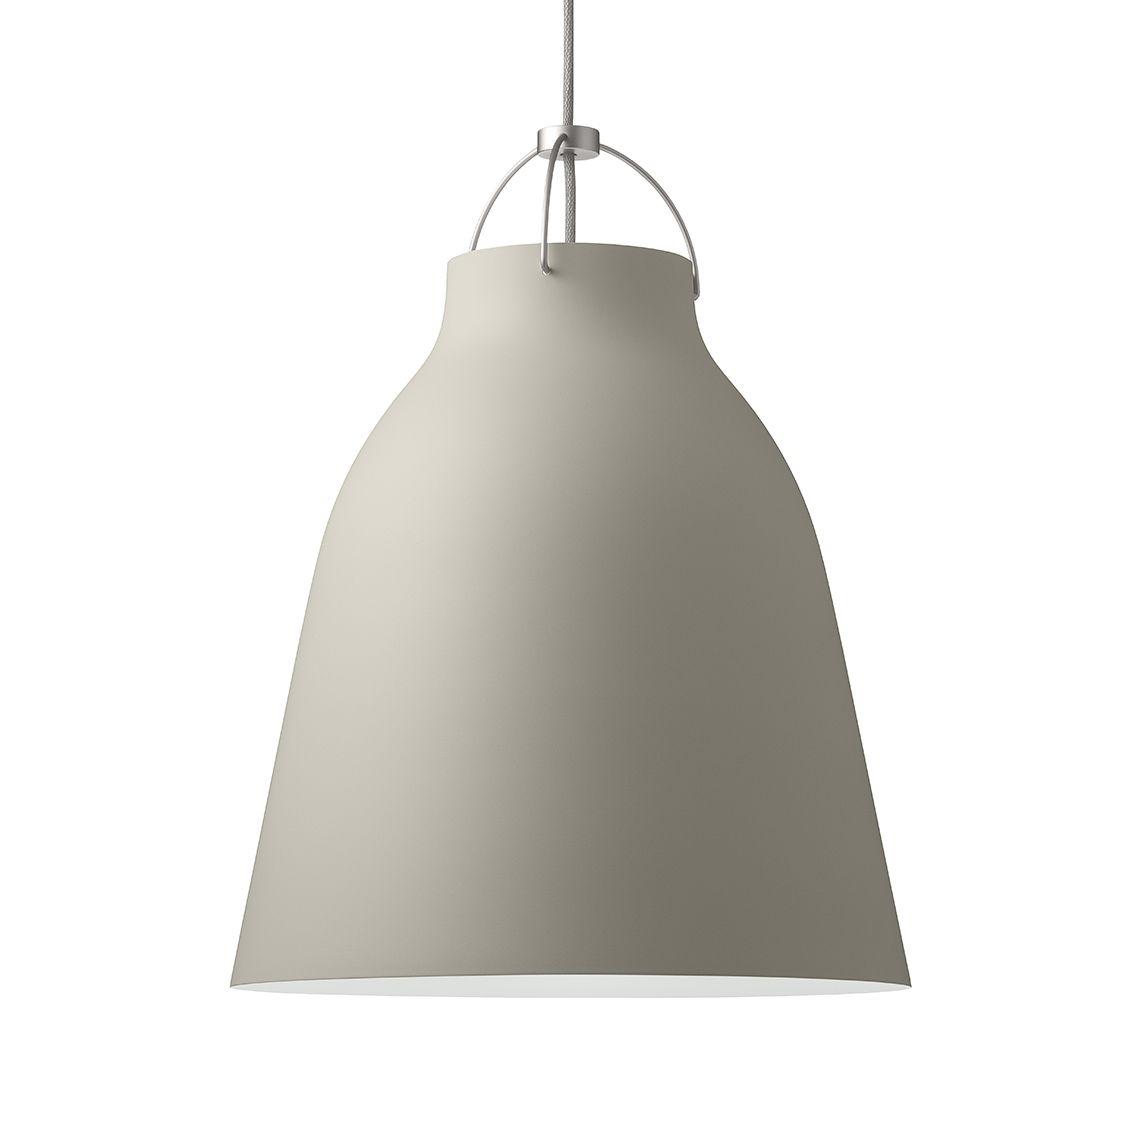 Caravaggio hanglamp Lightyears Ø40 Warm Silk